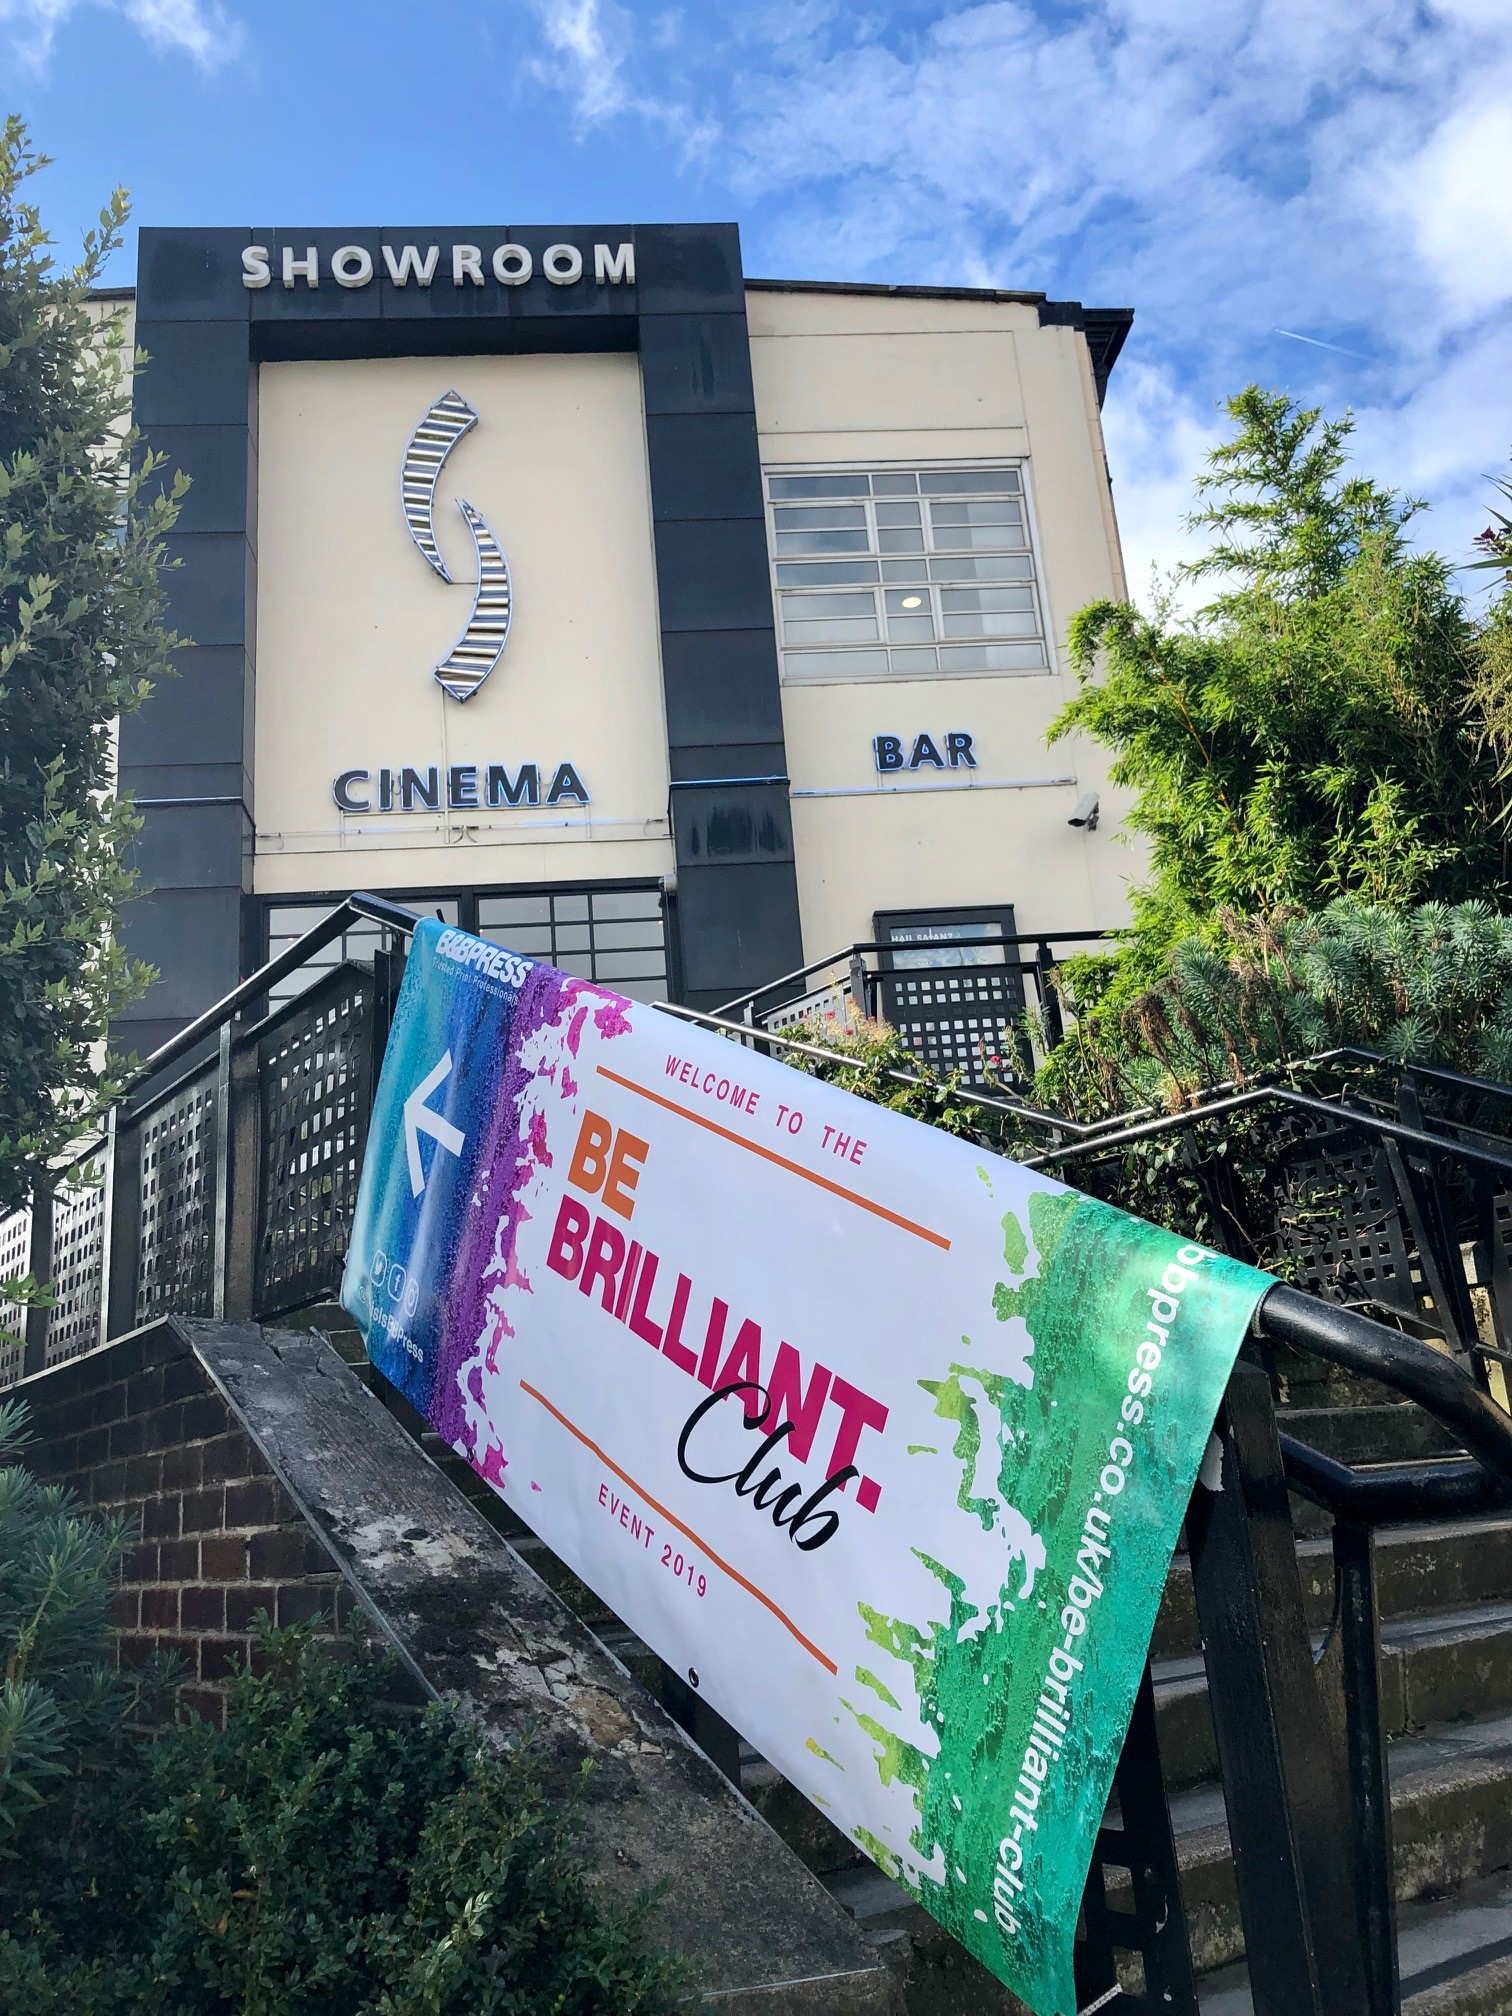 Showroom Cinema on event day